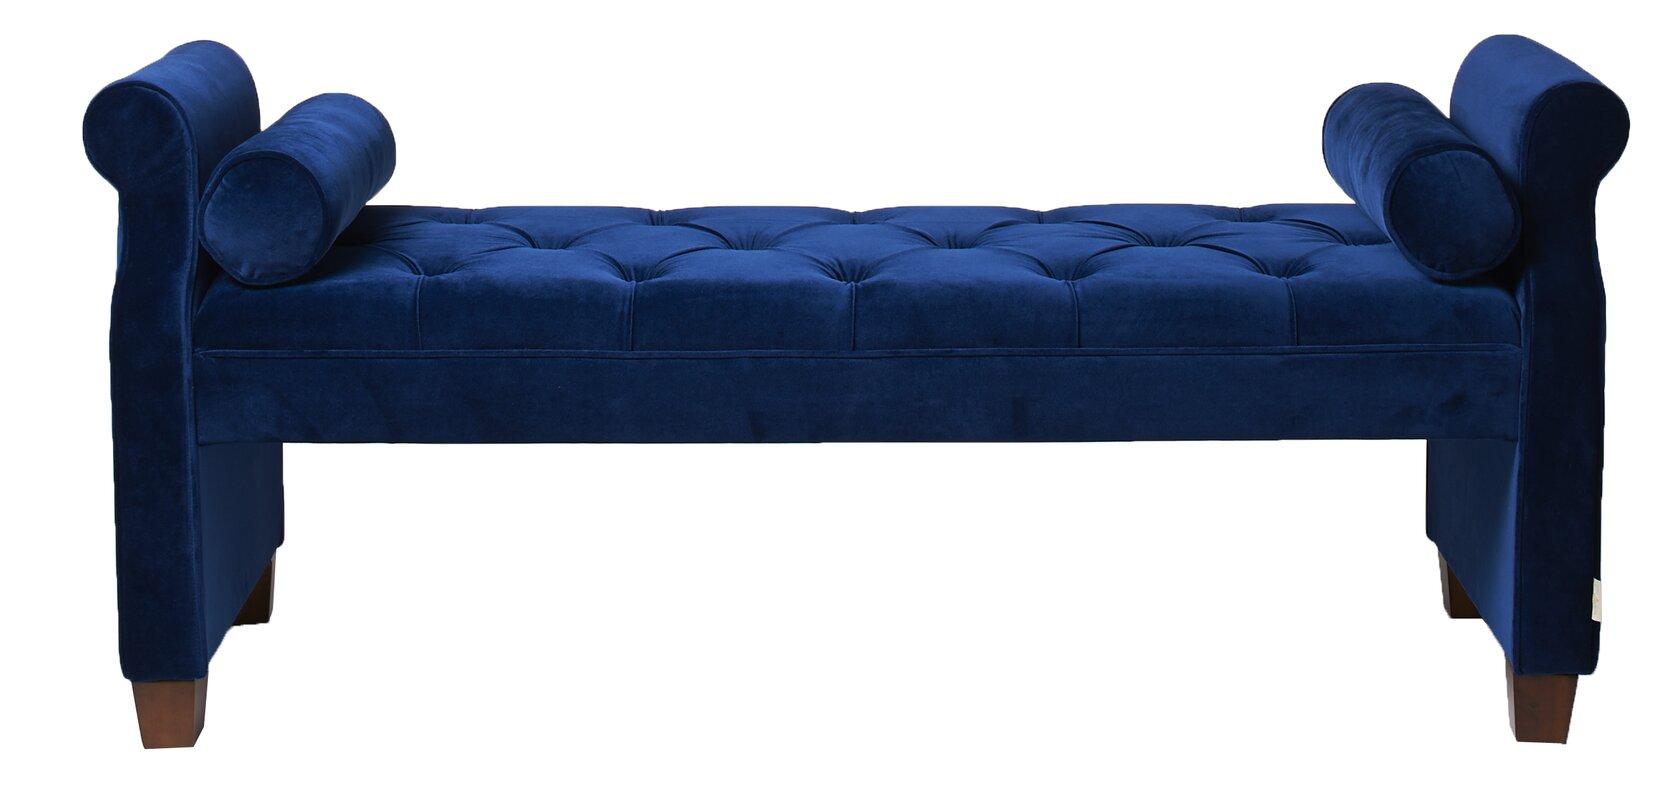 everly quinn belby upholstered bedroom bench  reviews  wayfair - defaultname